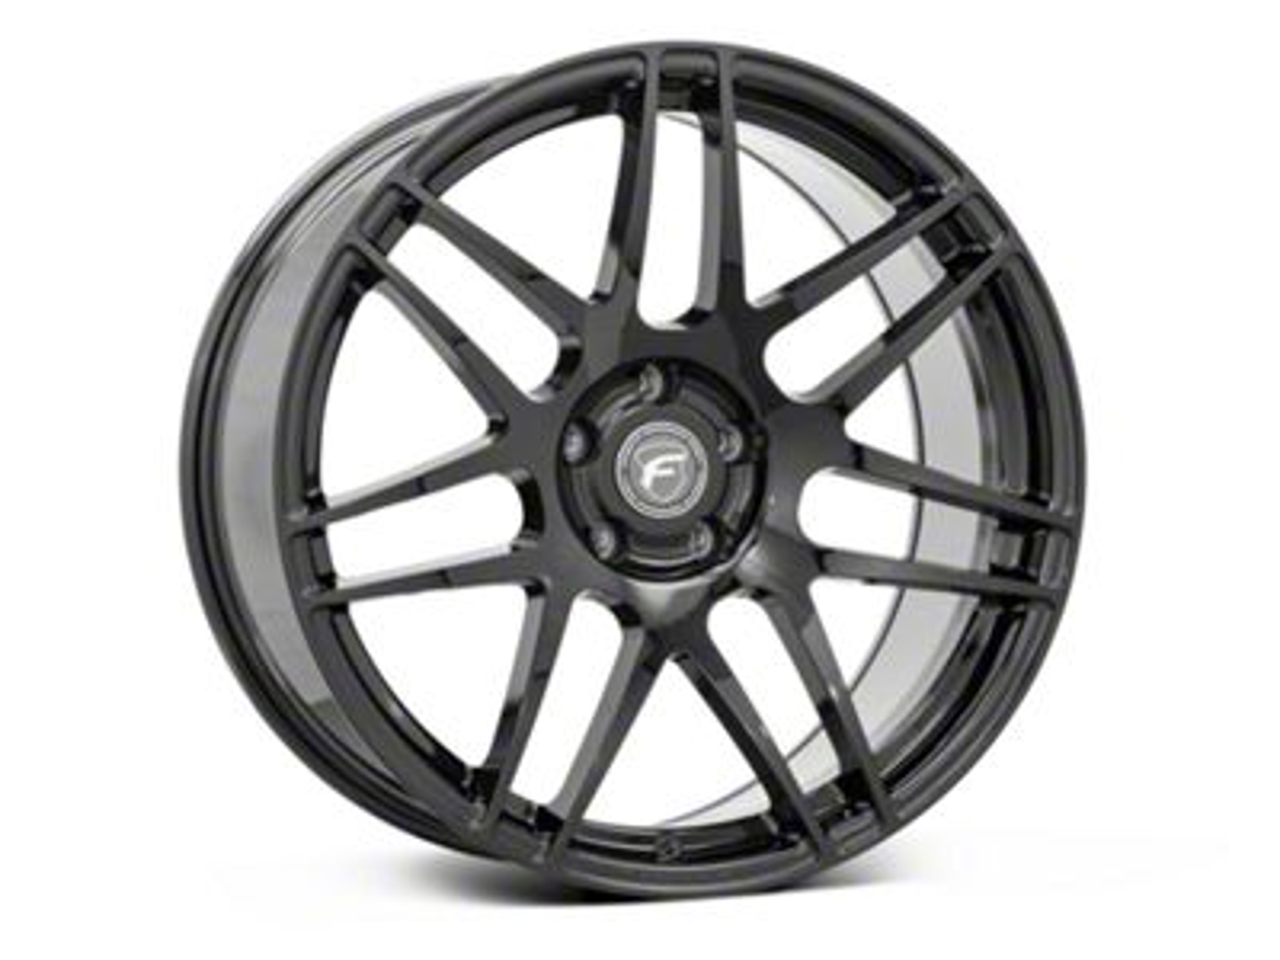 Forgestar F14 Monoblock Piano Black Wheel - 20x9.5 (15-19 GT, EcoBoost, V6)